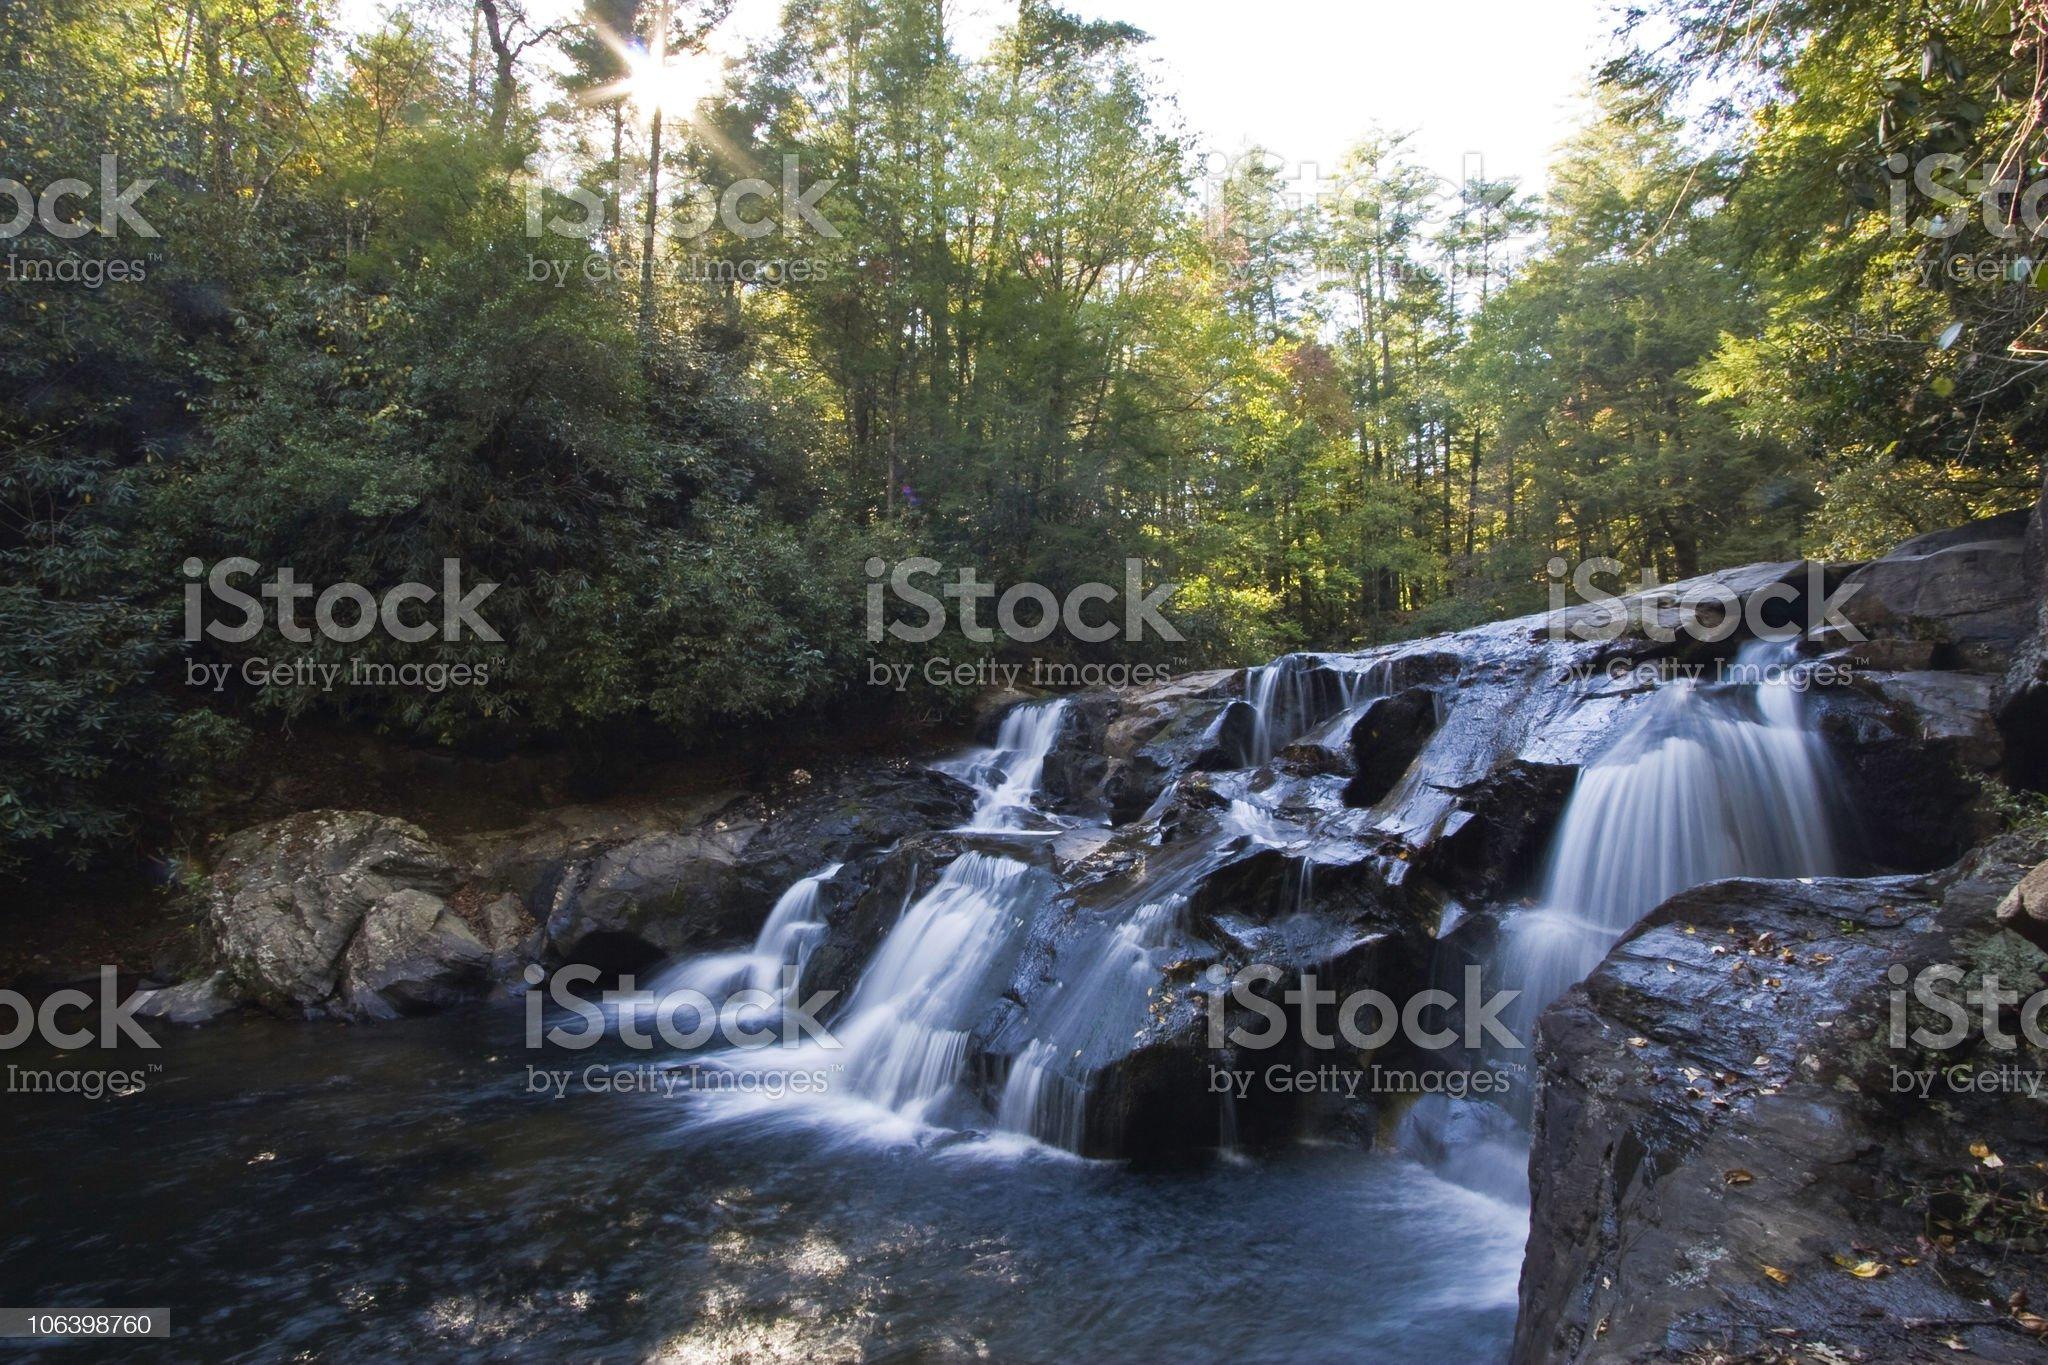 Dick's creek falls royalty-free stock photo